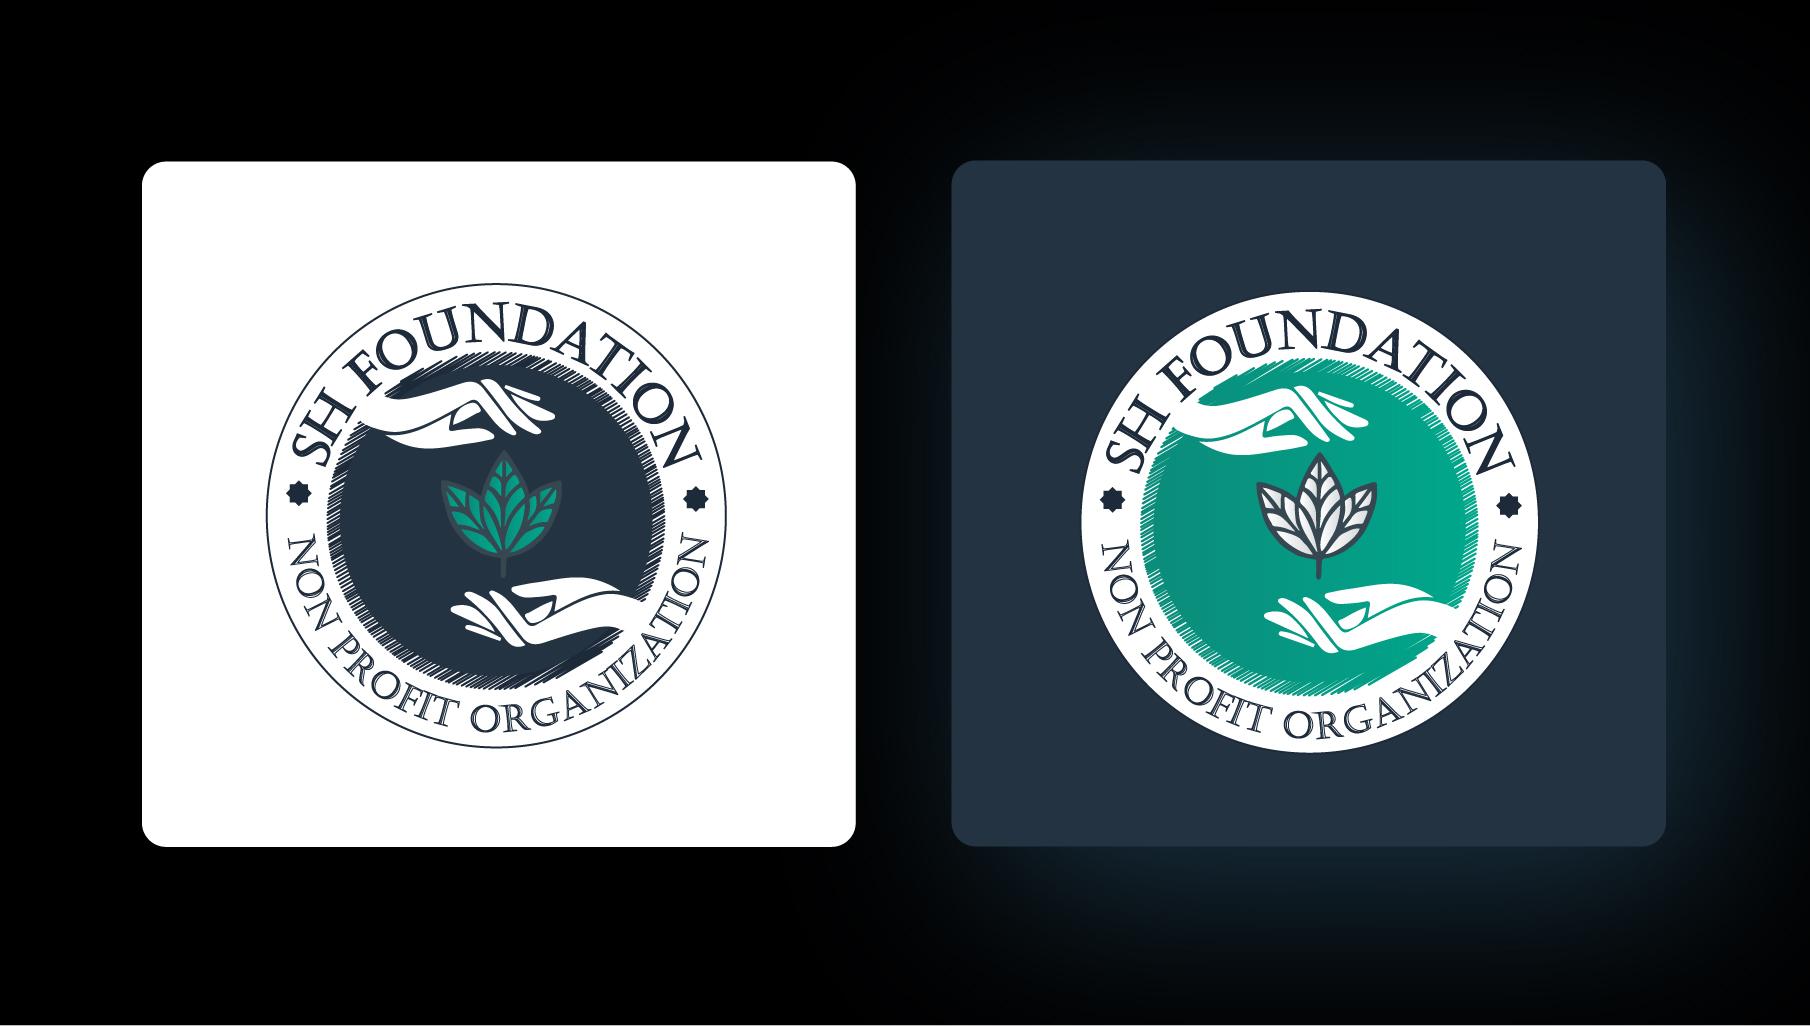 I will design 2 Professional Logo